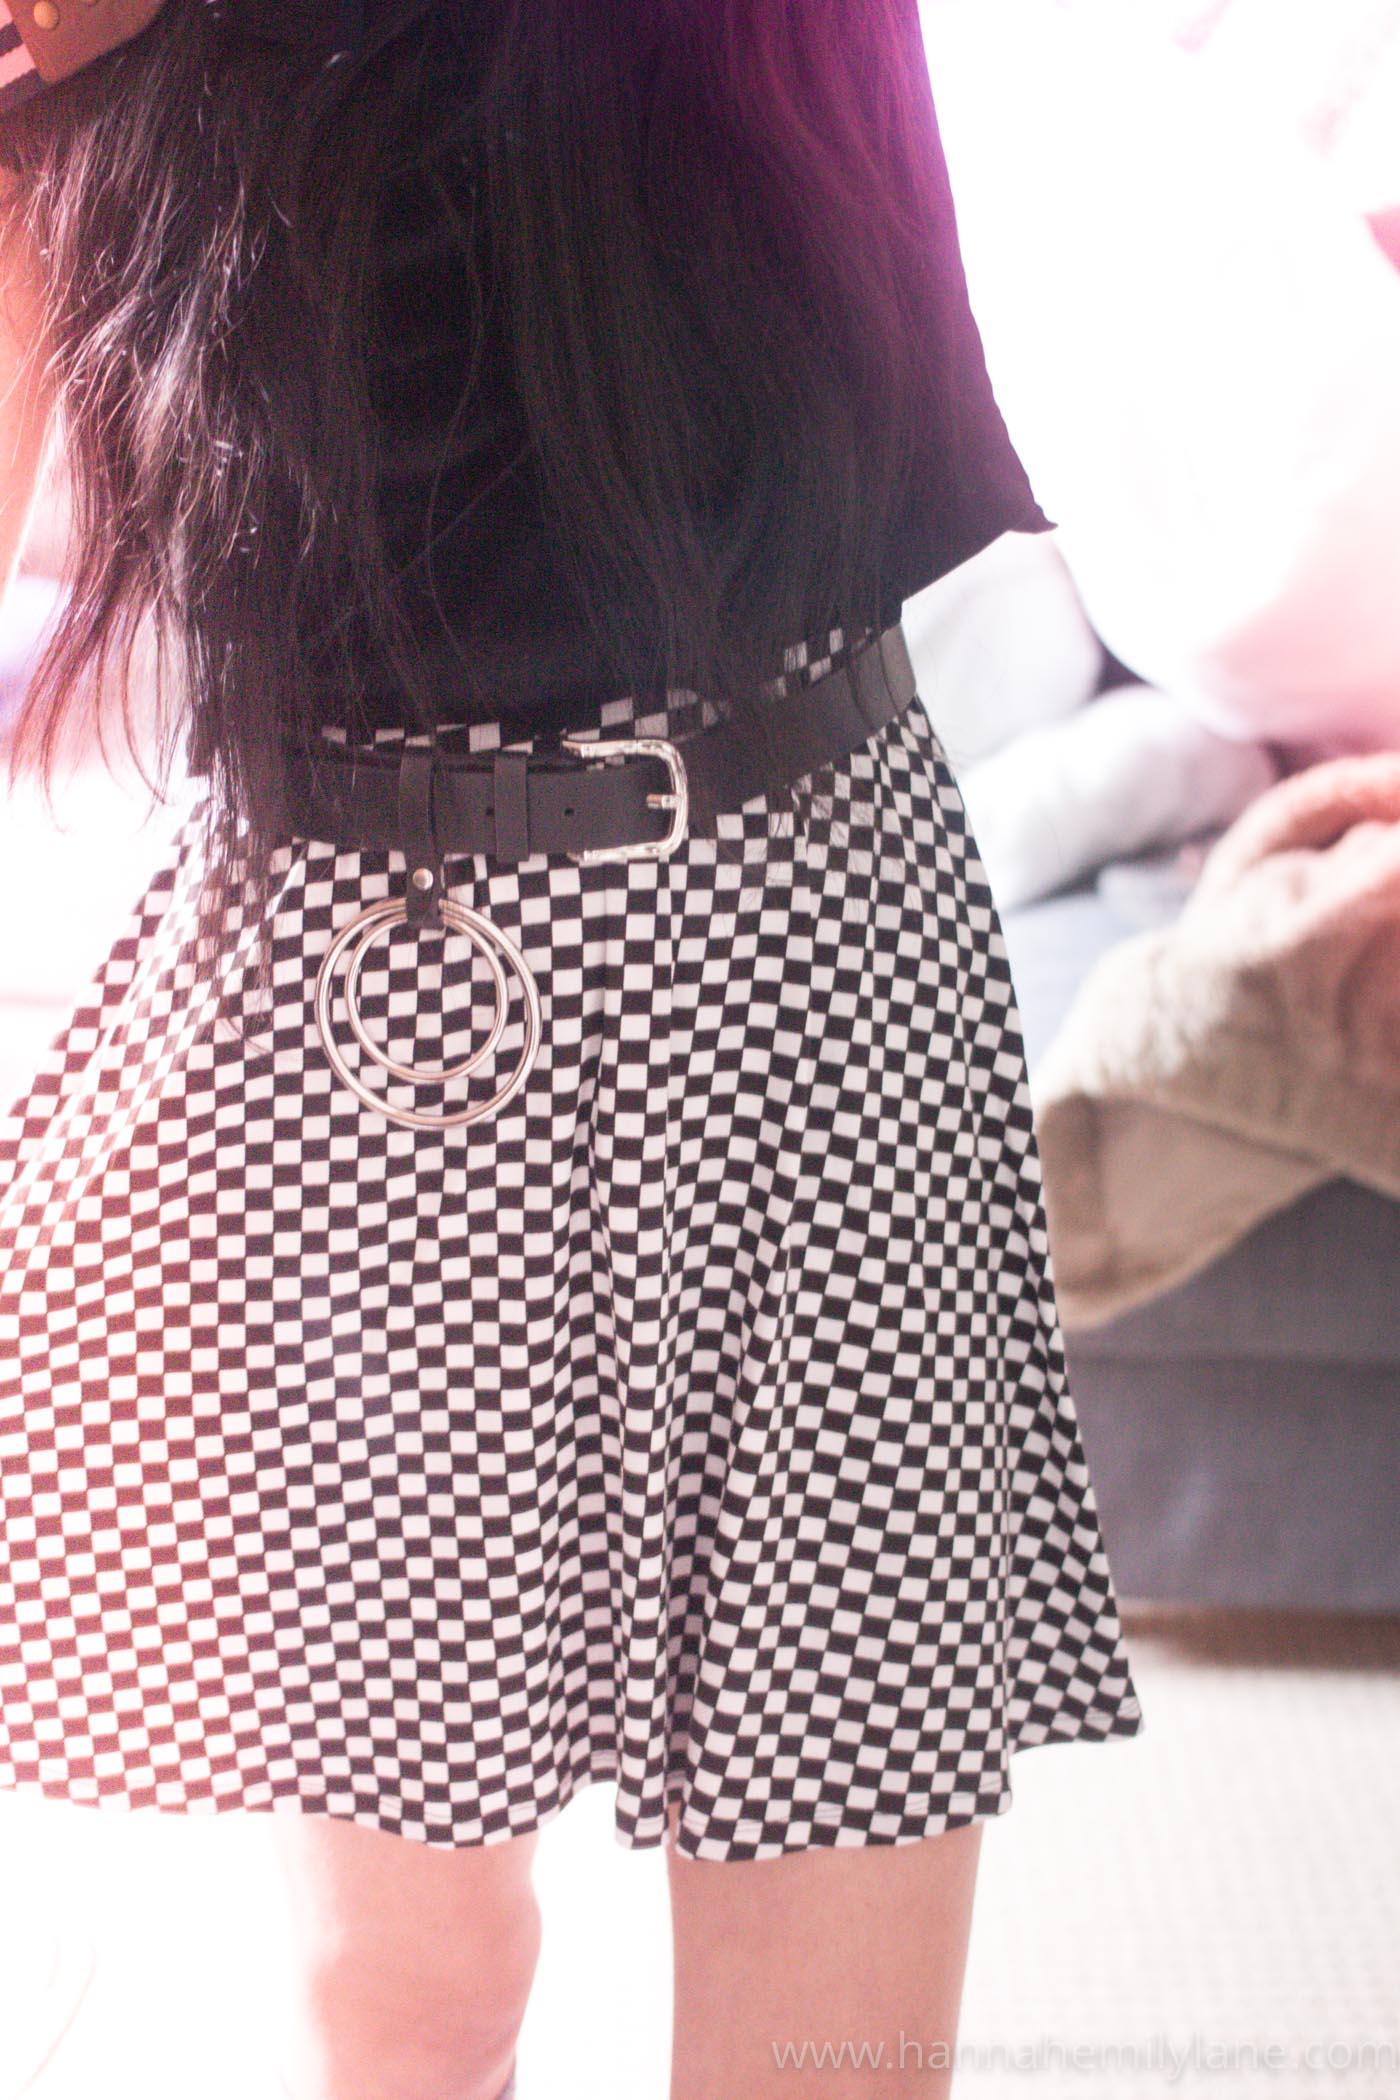 Checkerboard Skirt  | www.hannahemilylane.com